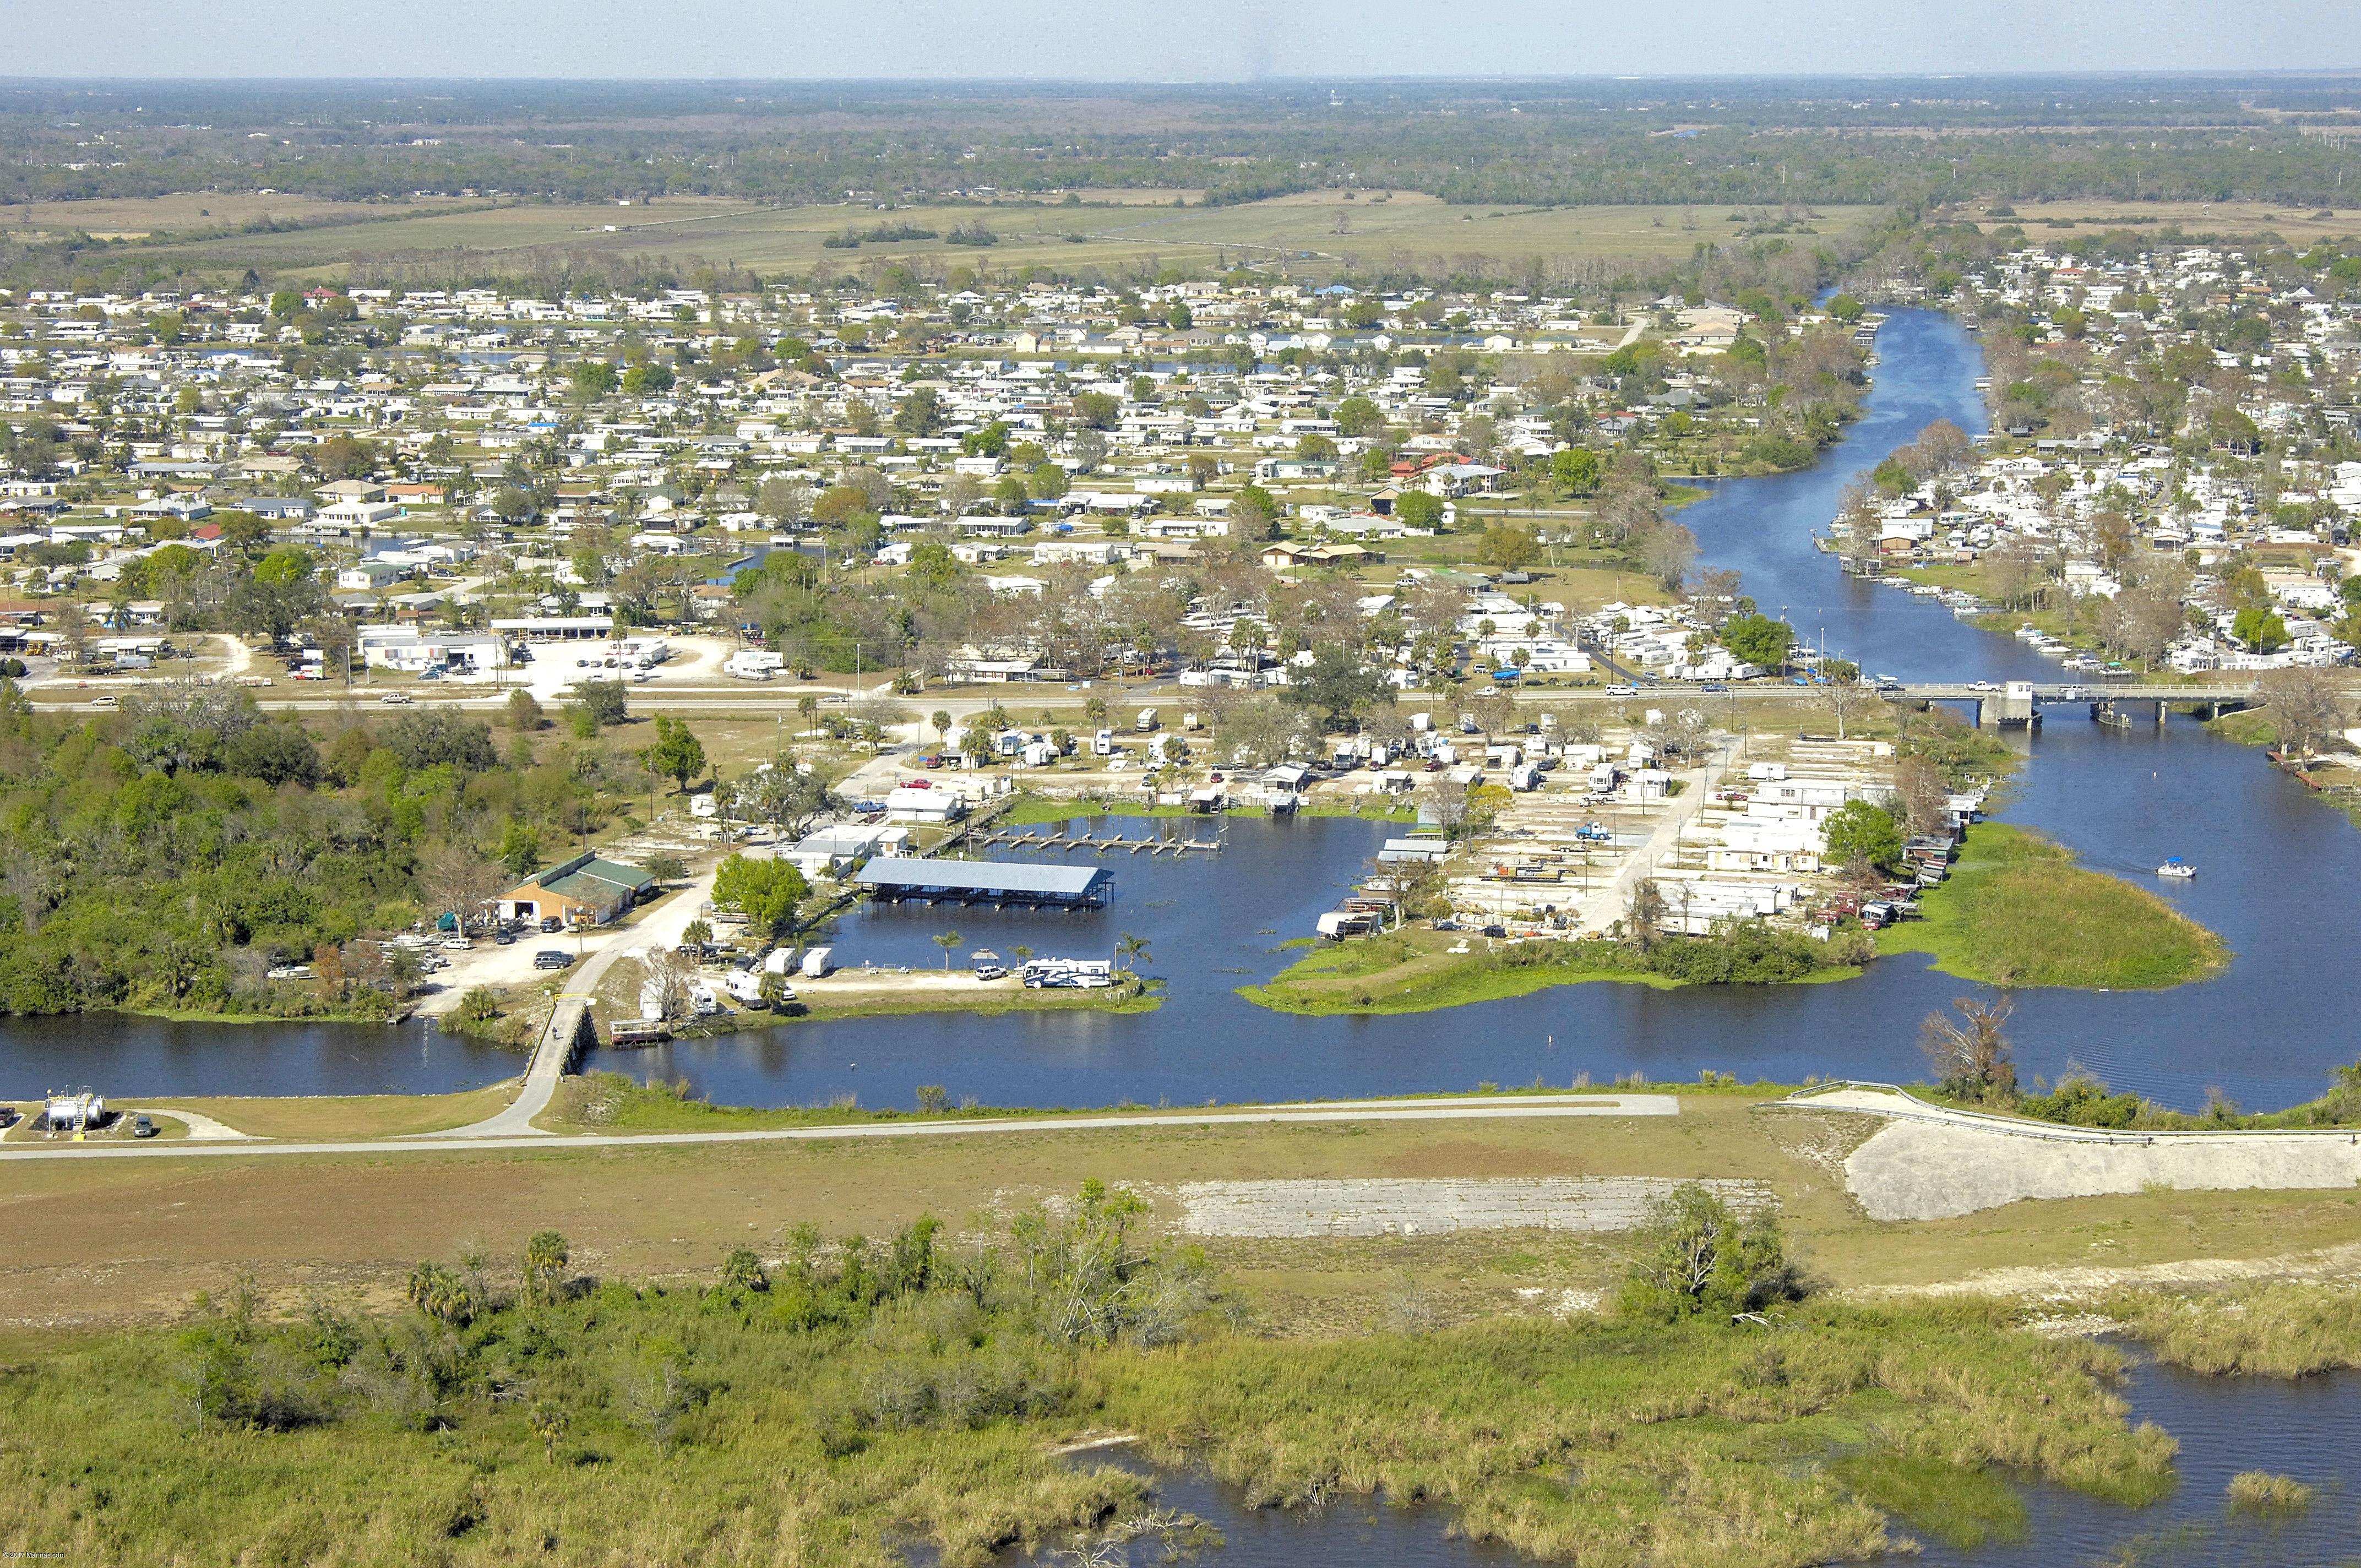 Taylor Creek Resort & RV Park in Okeechobee, FL, United States - Marina Reviews - Phone Number ...